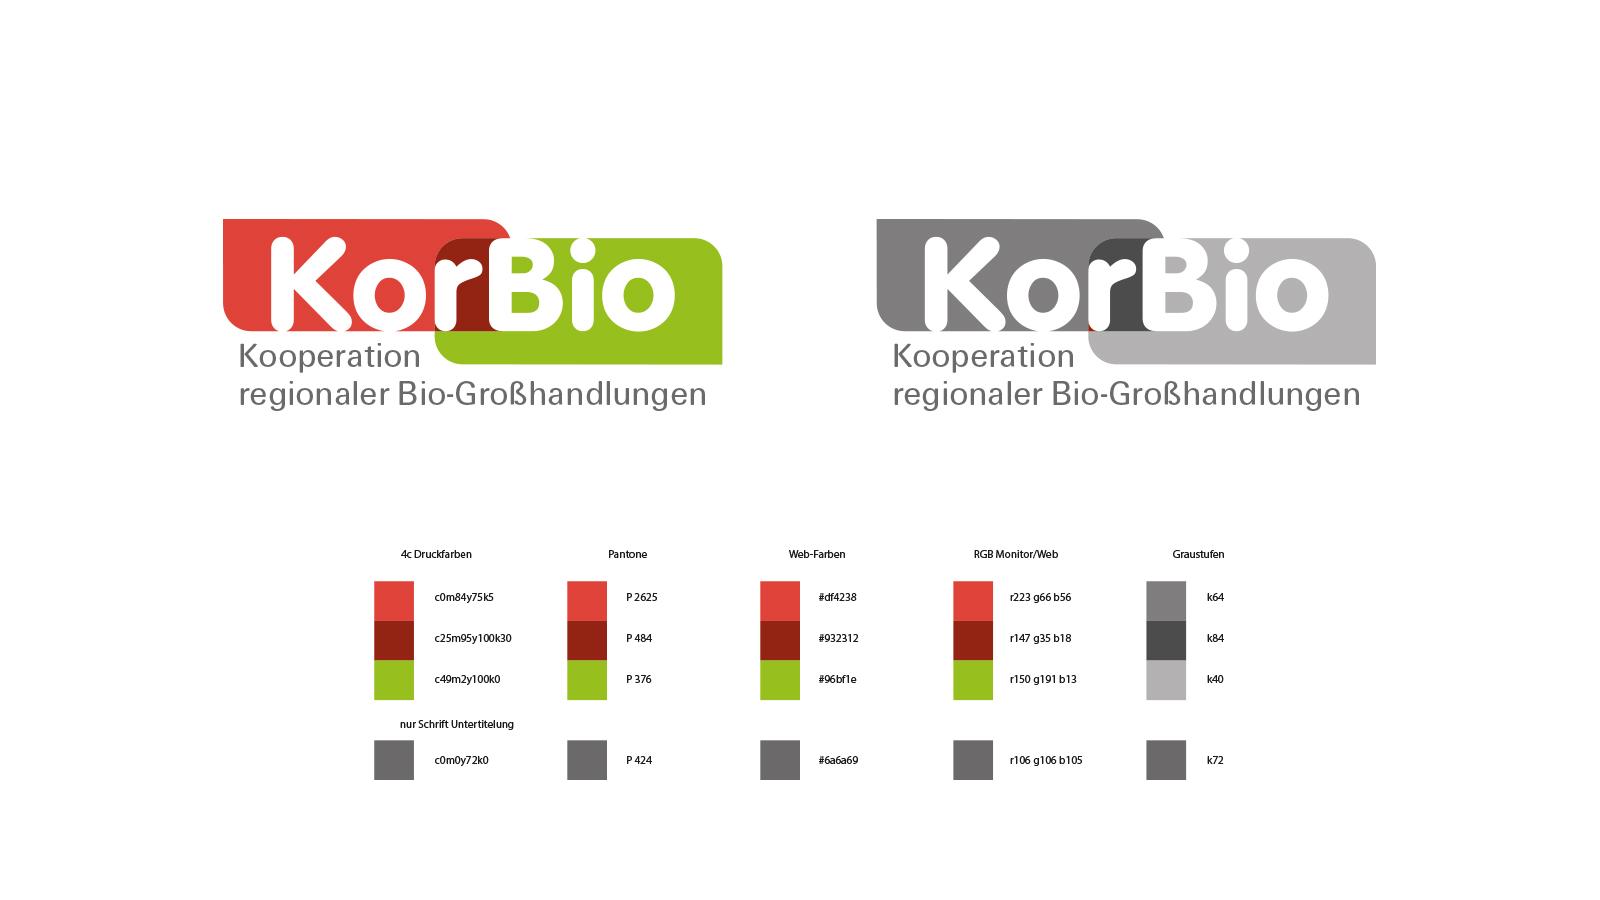 KorBio GmbH